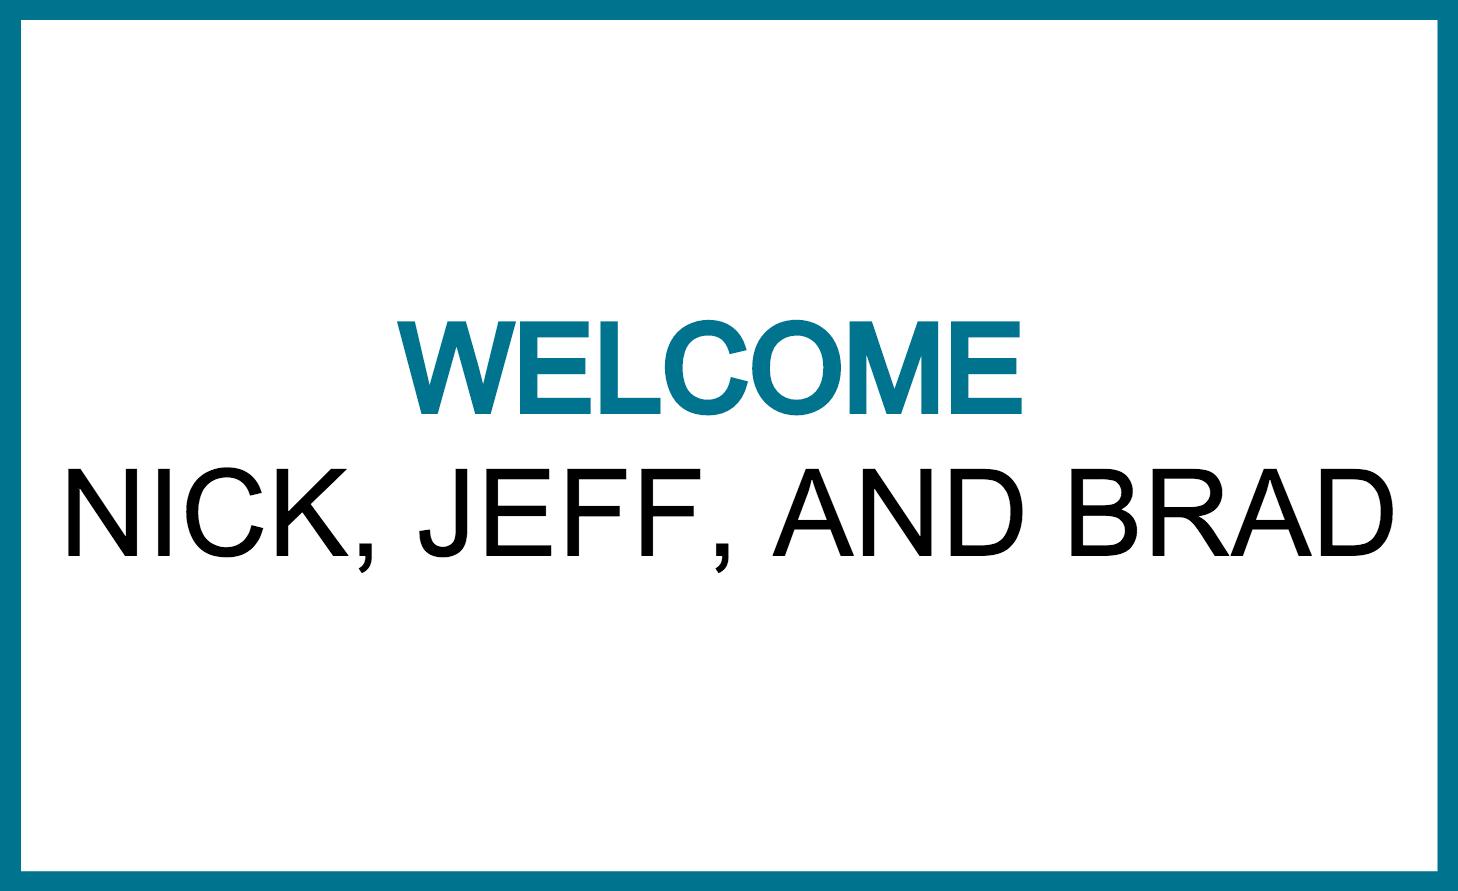 welcome nick jeff brad.png